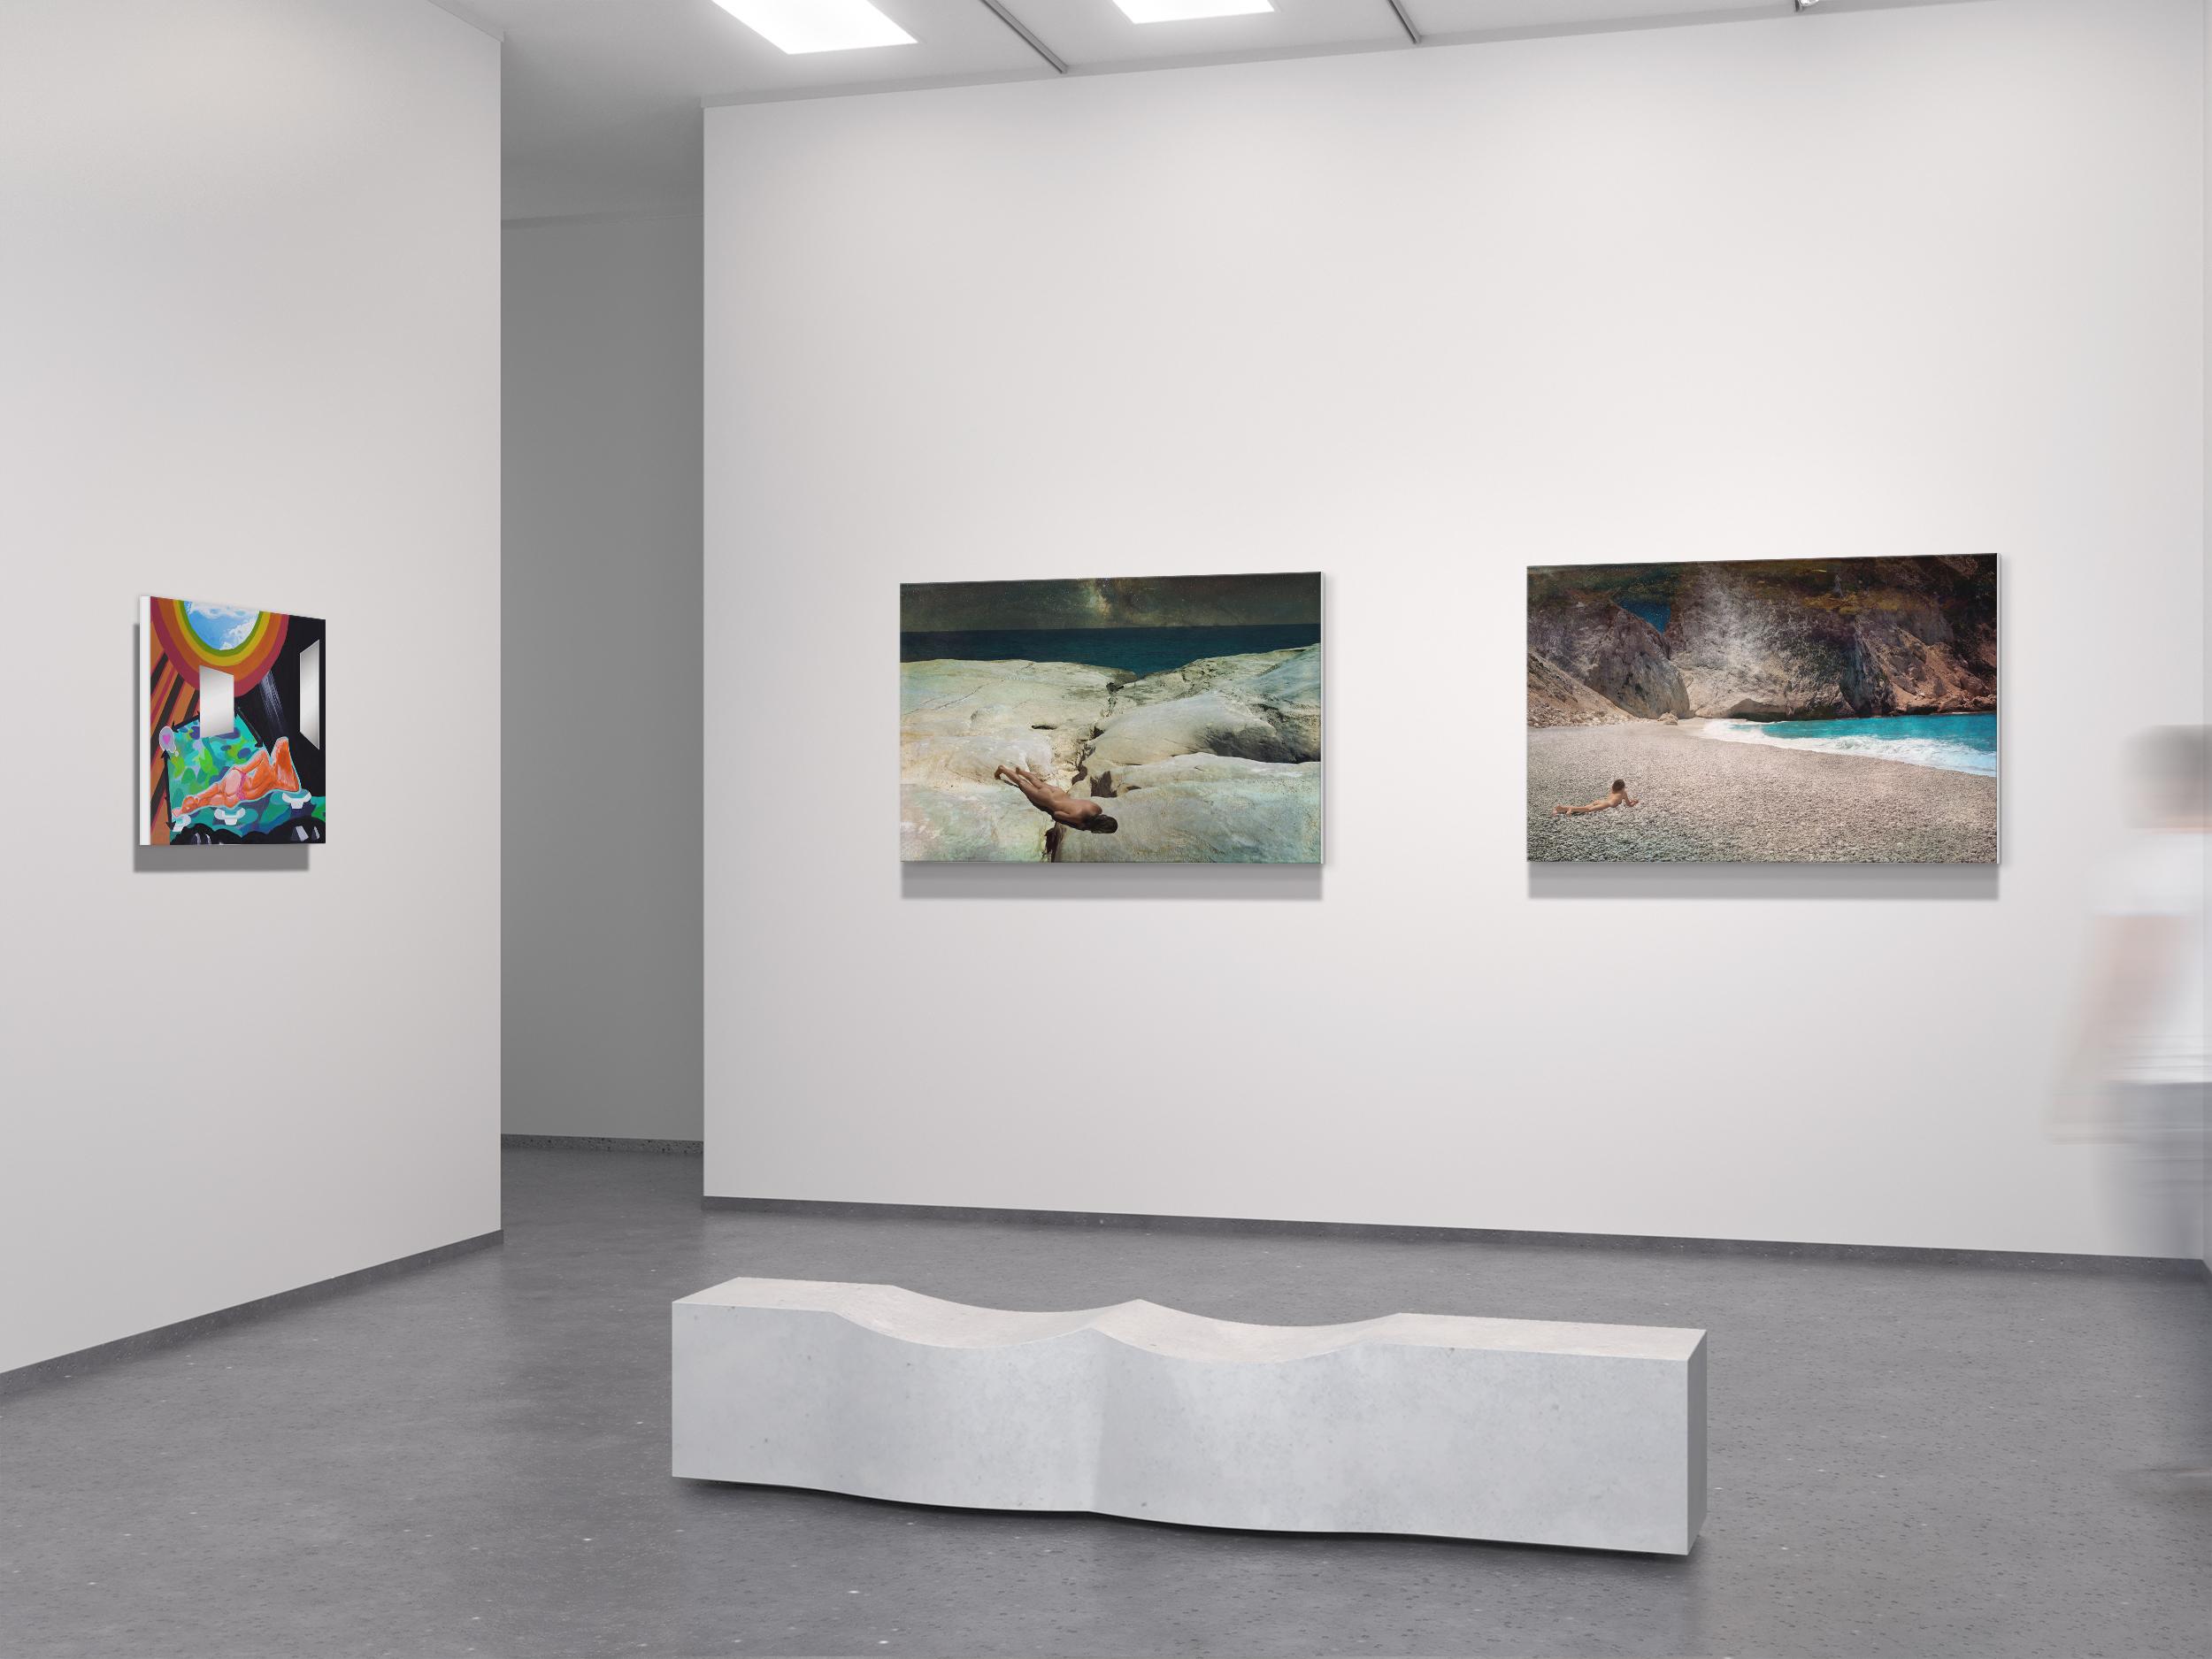 4_Laurel-Johanneson Gallery_ecke_2500x1875px